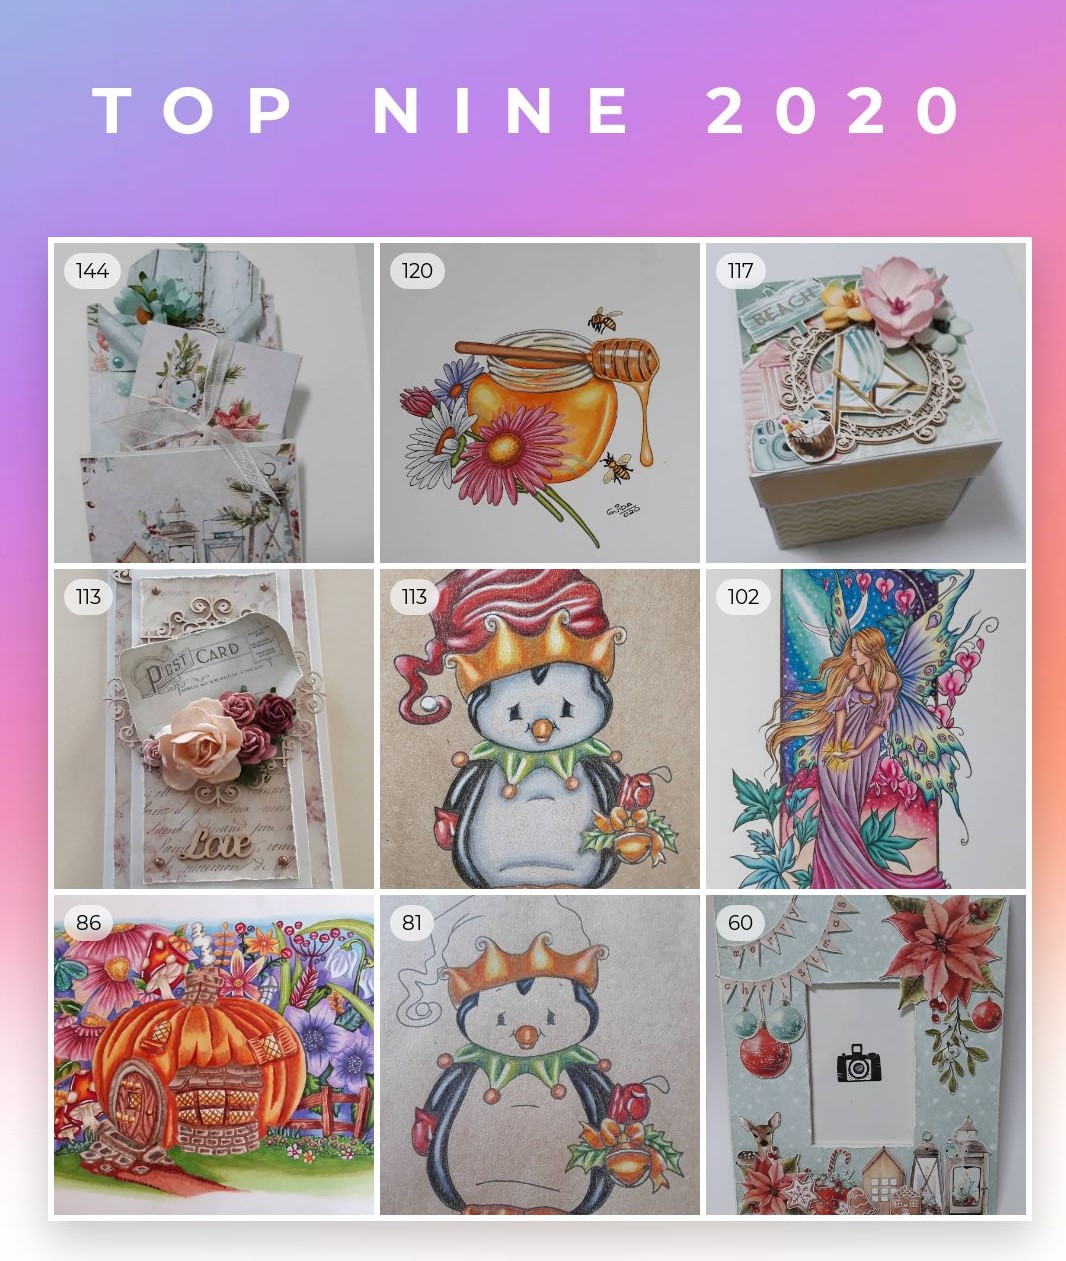 2020 Top Nine on Instagram